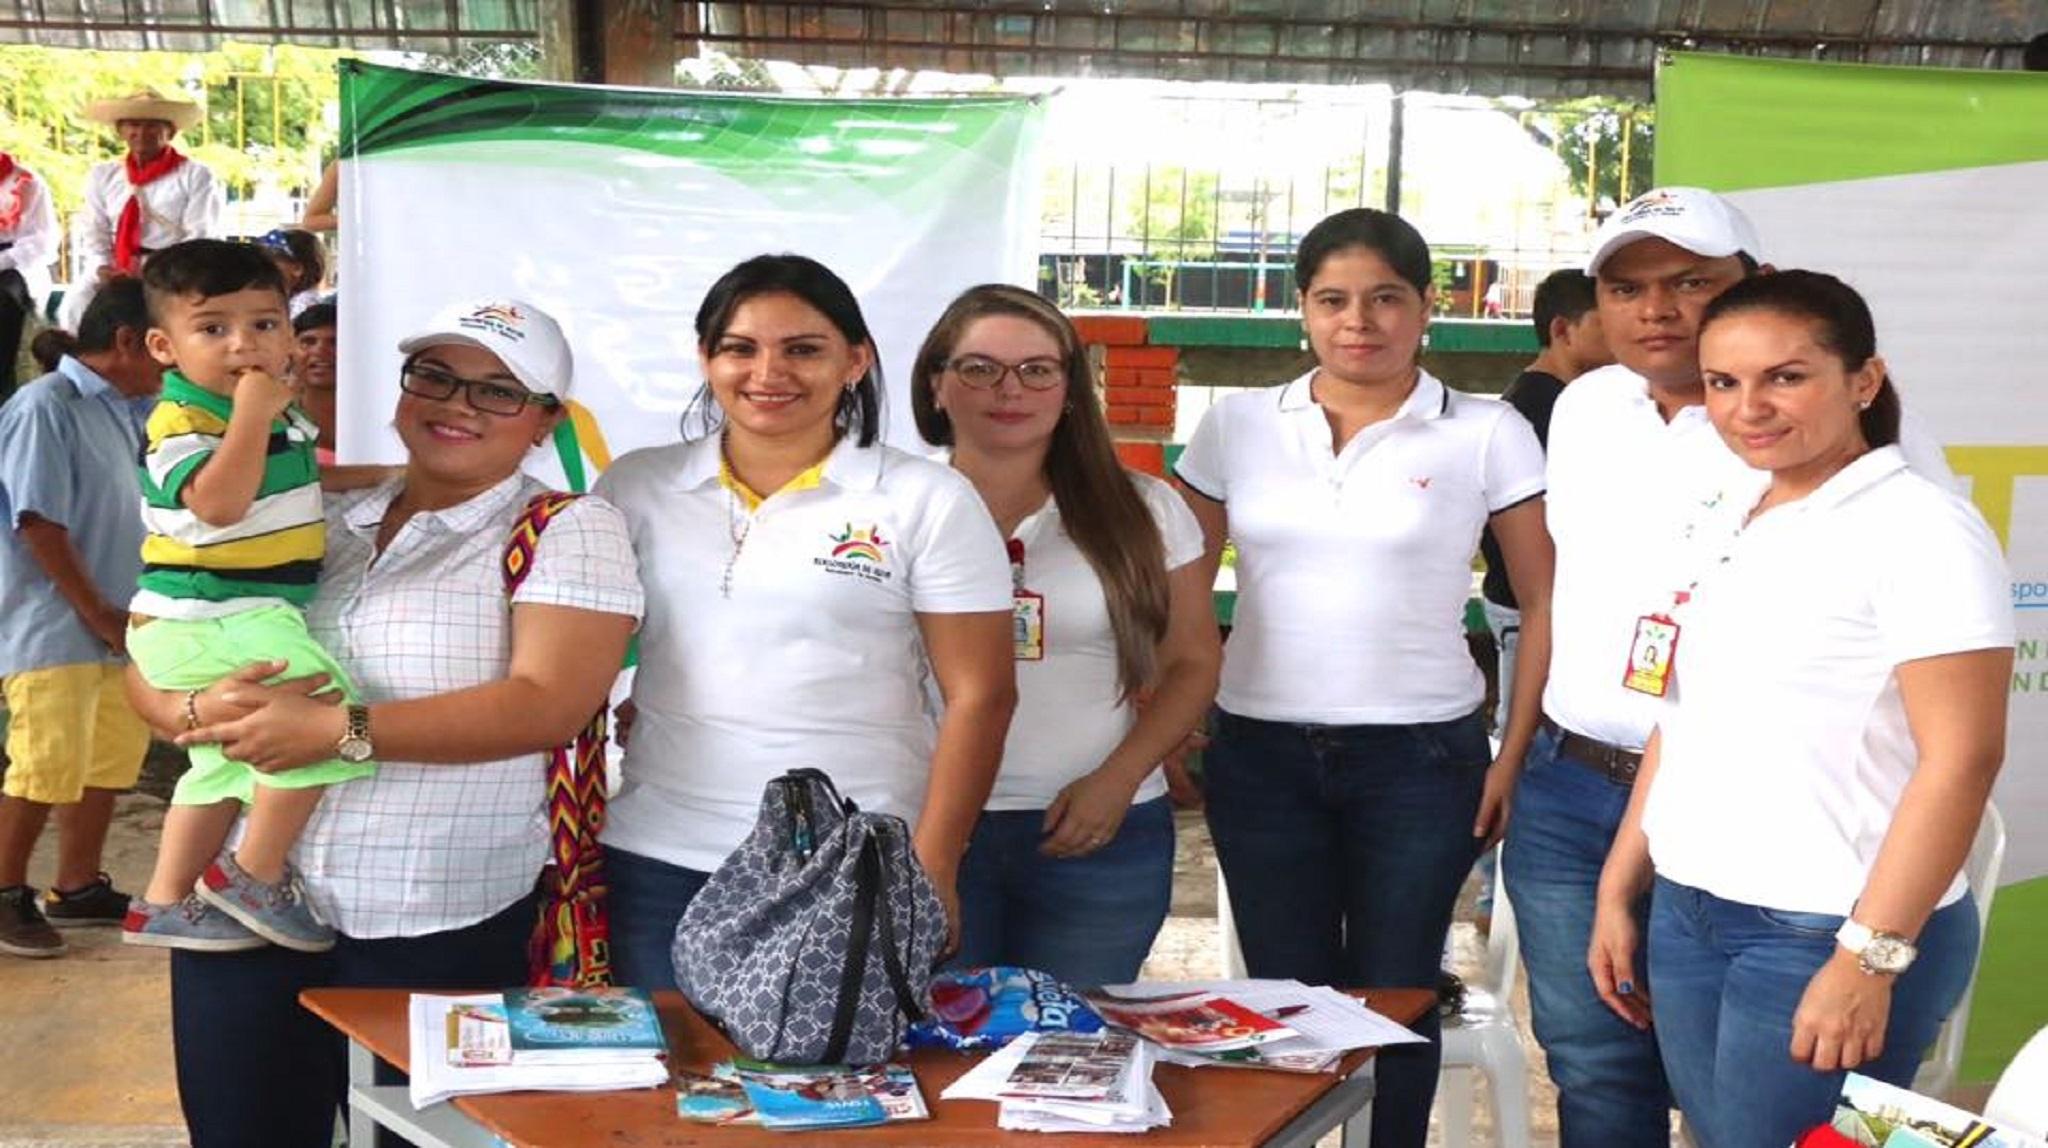 FERIA COMUNITARIA DE CONTROL FISCAL